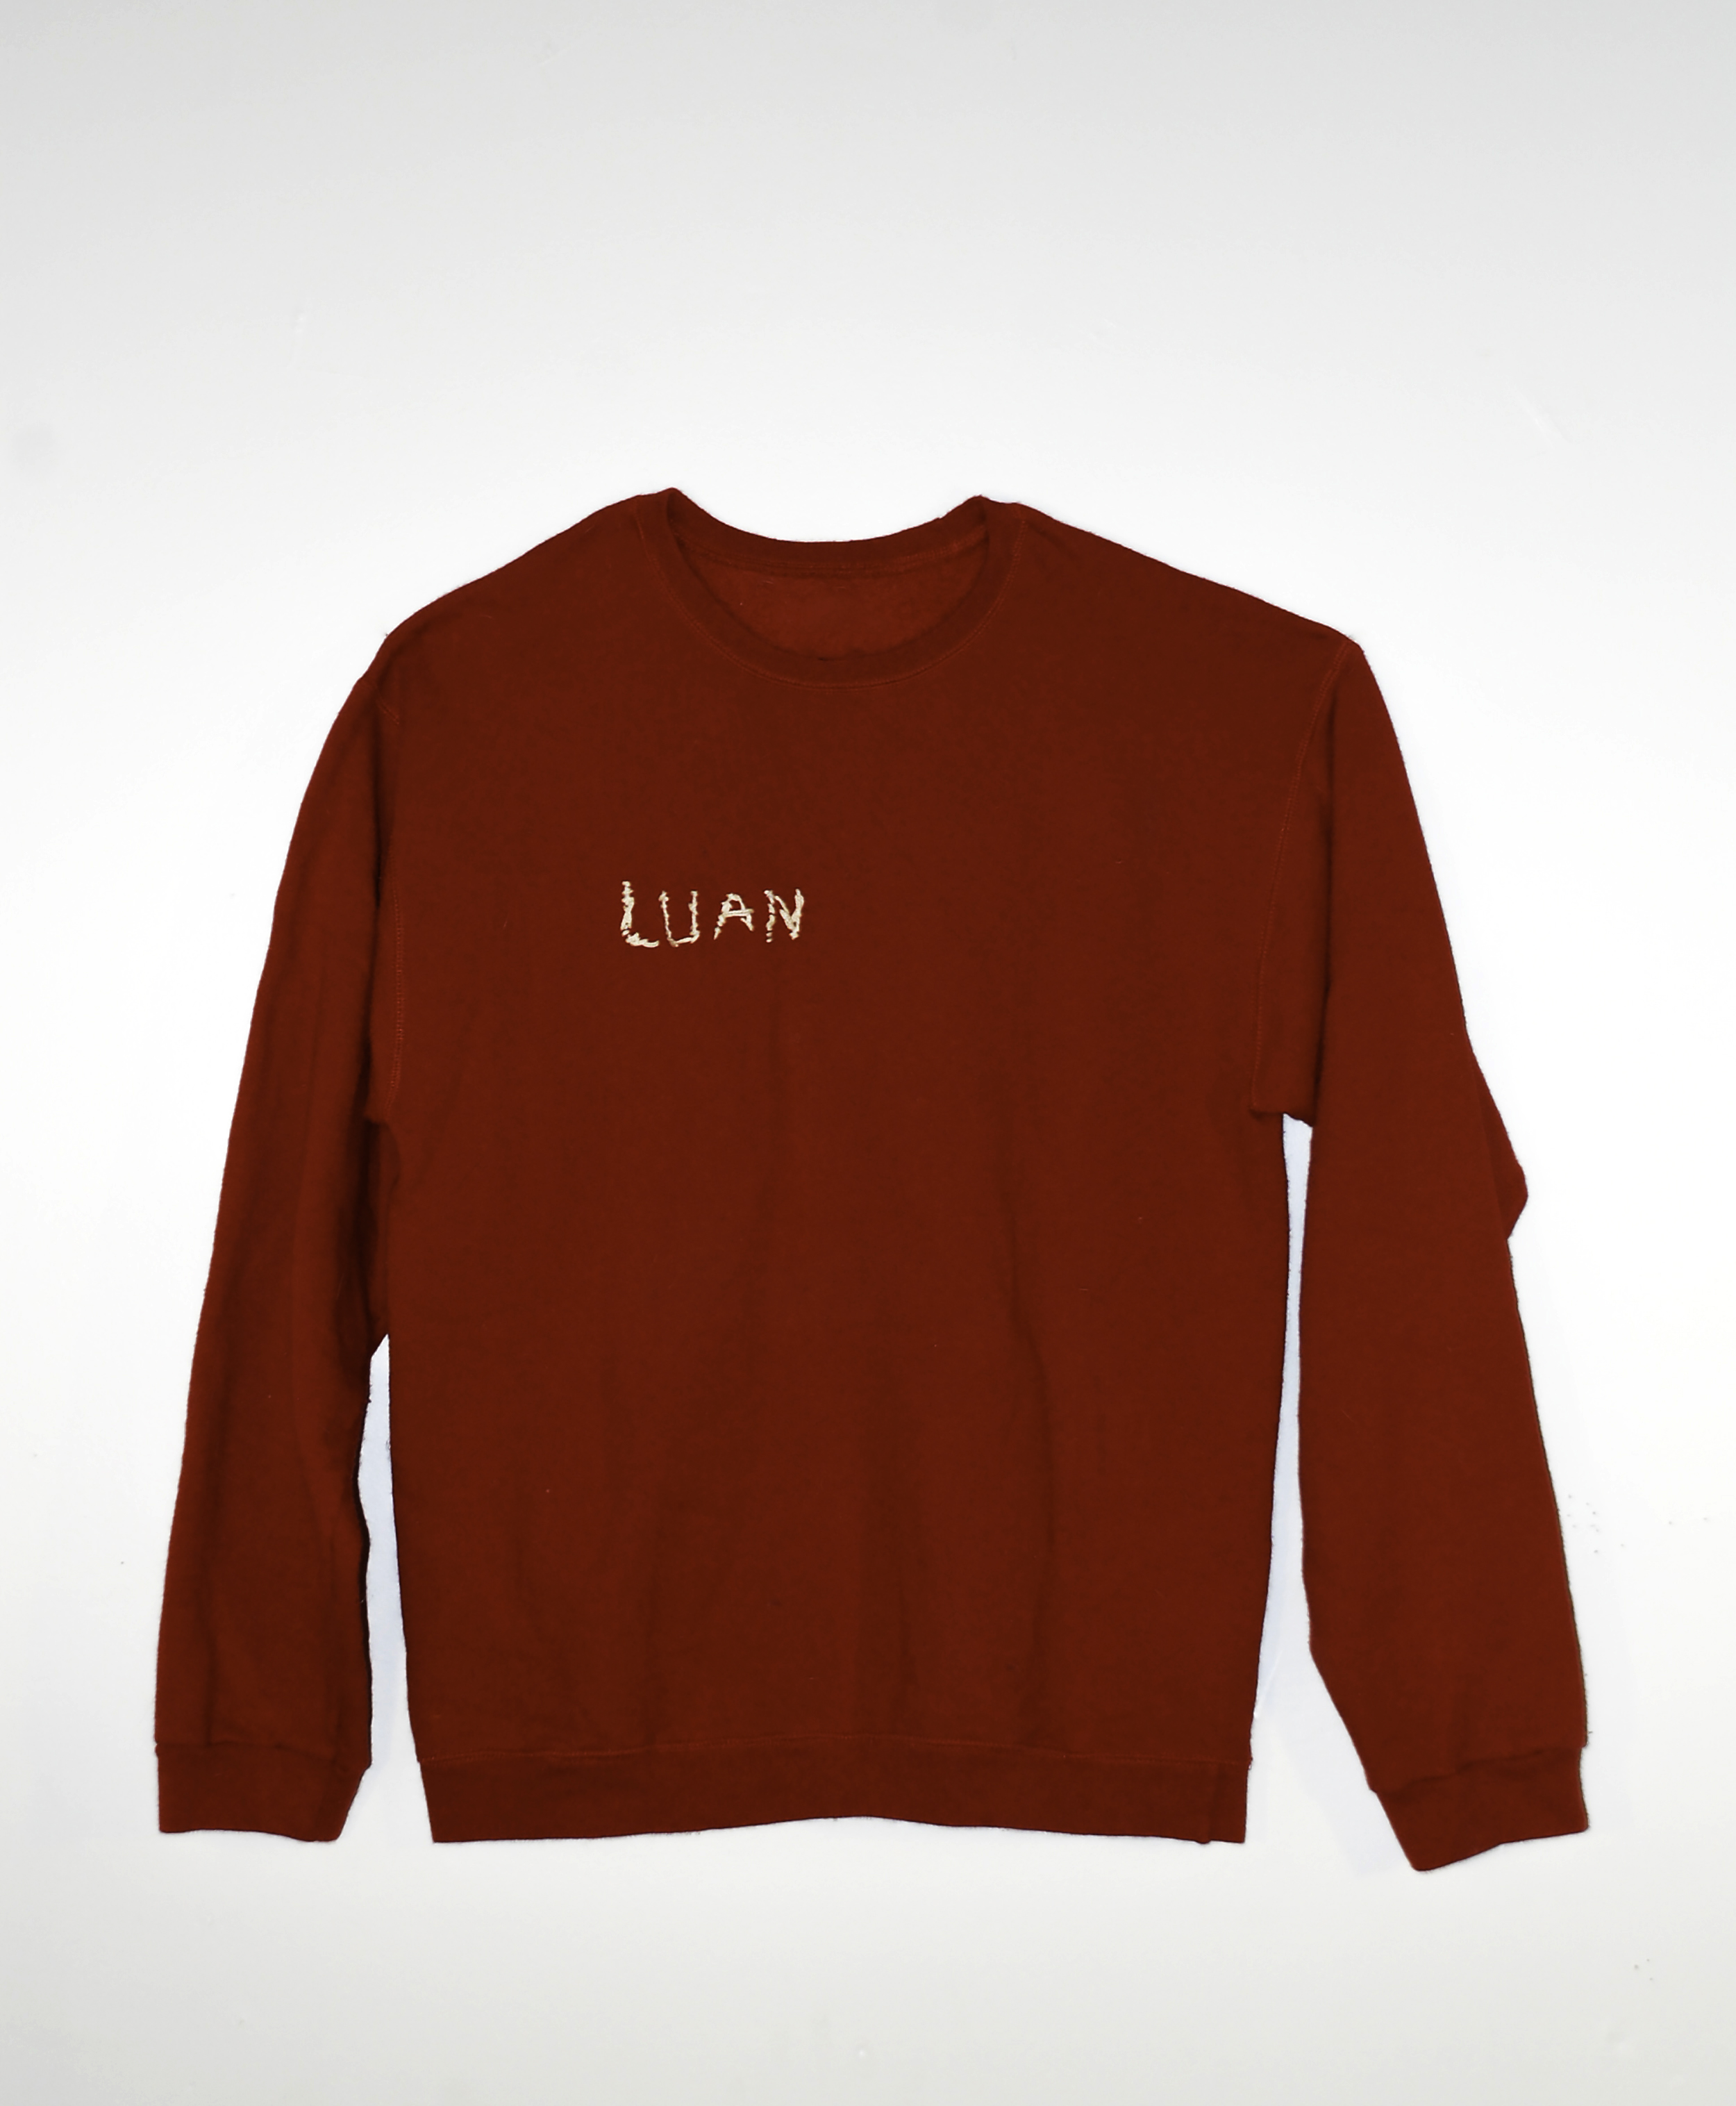 Luan Sweater Luan 2016.jpg